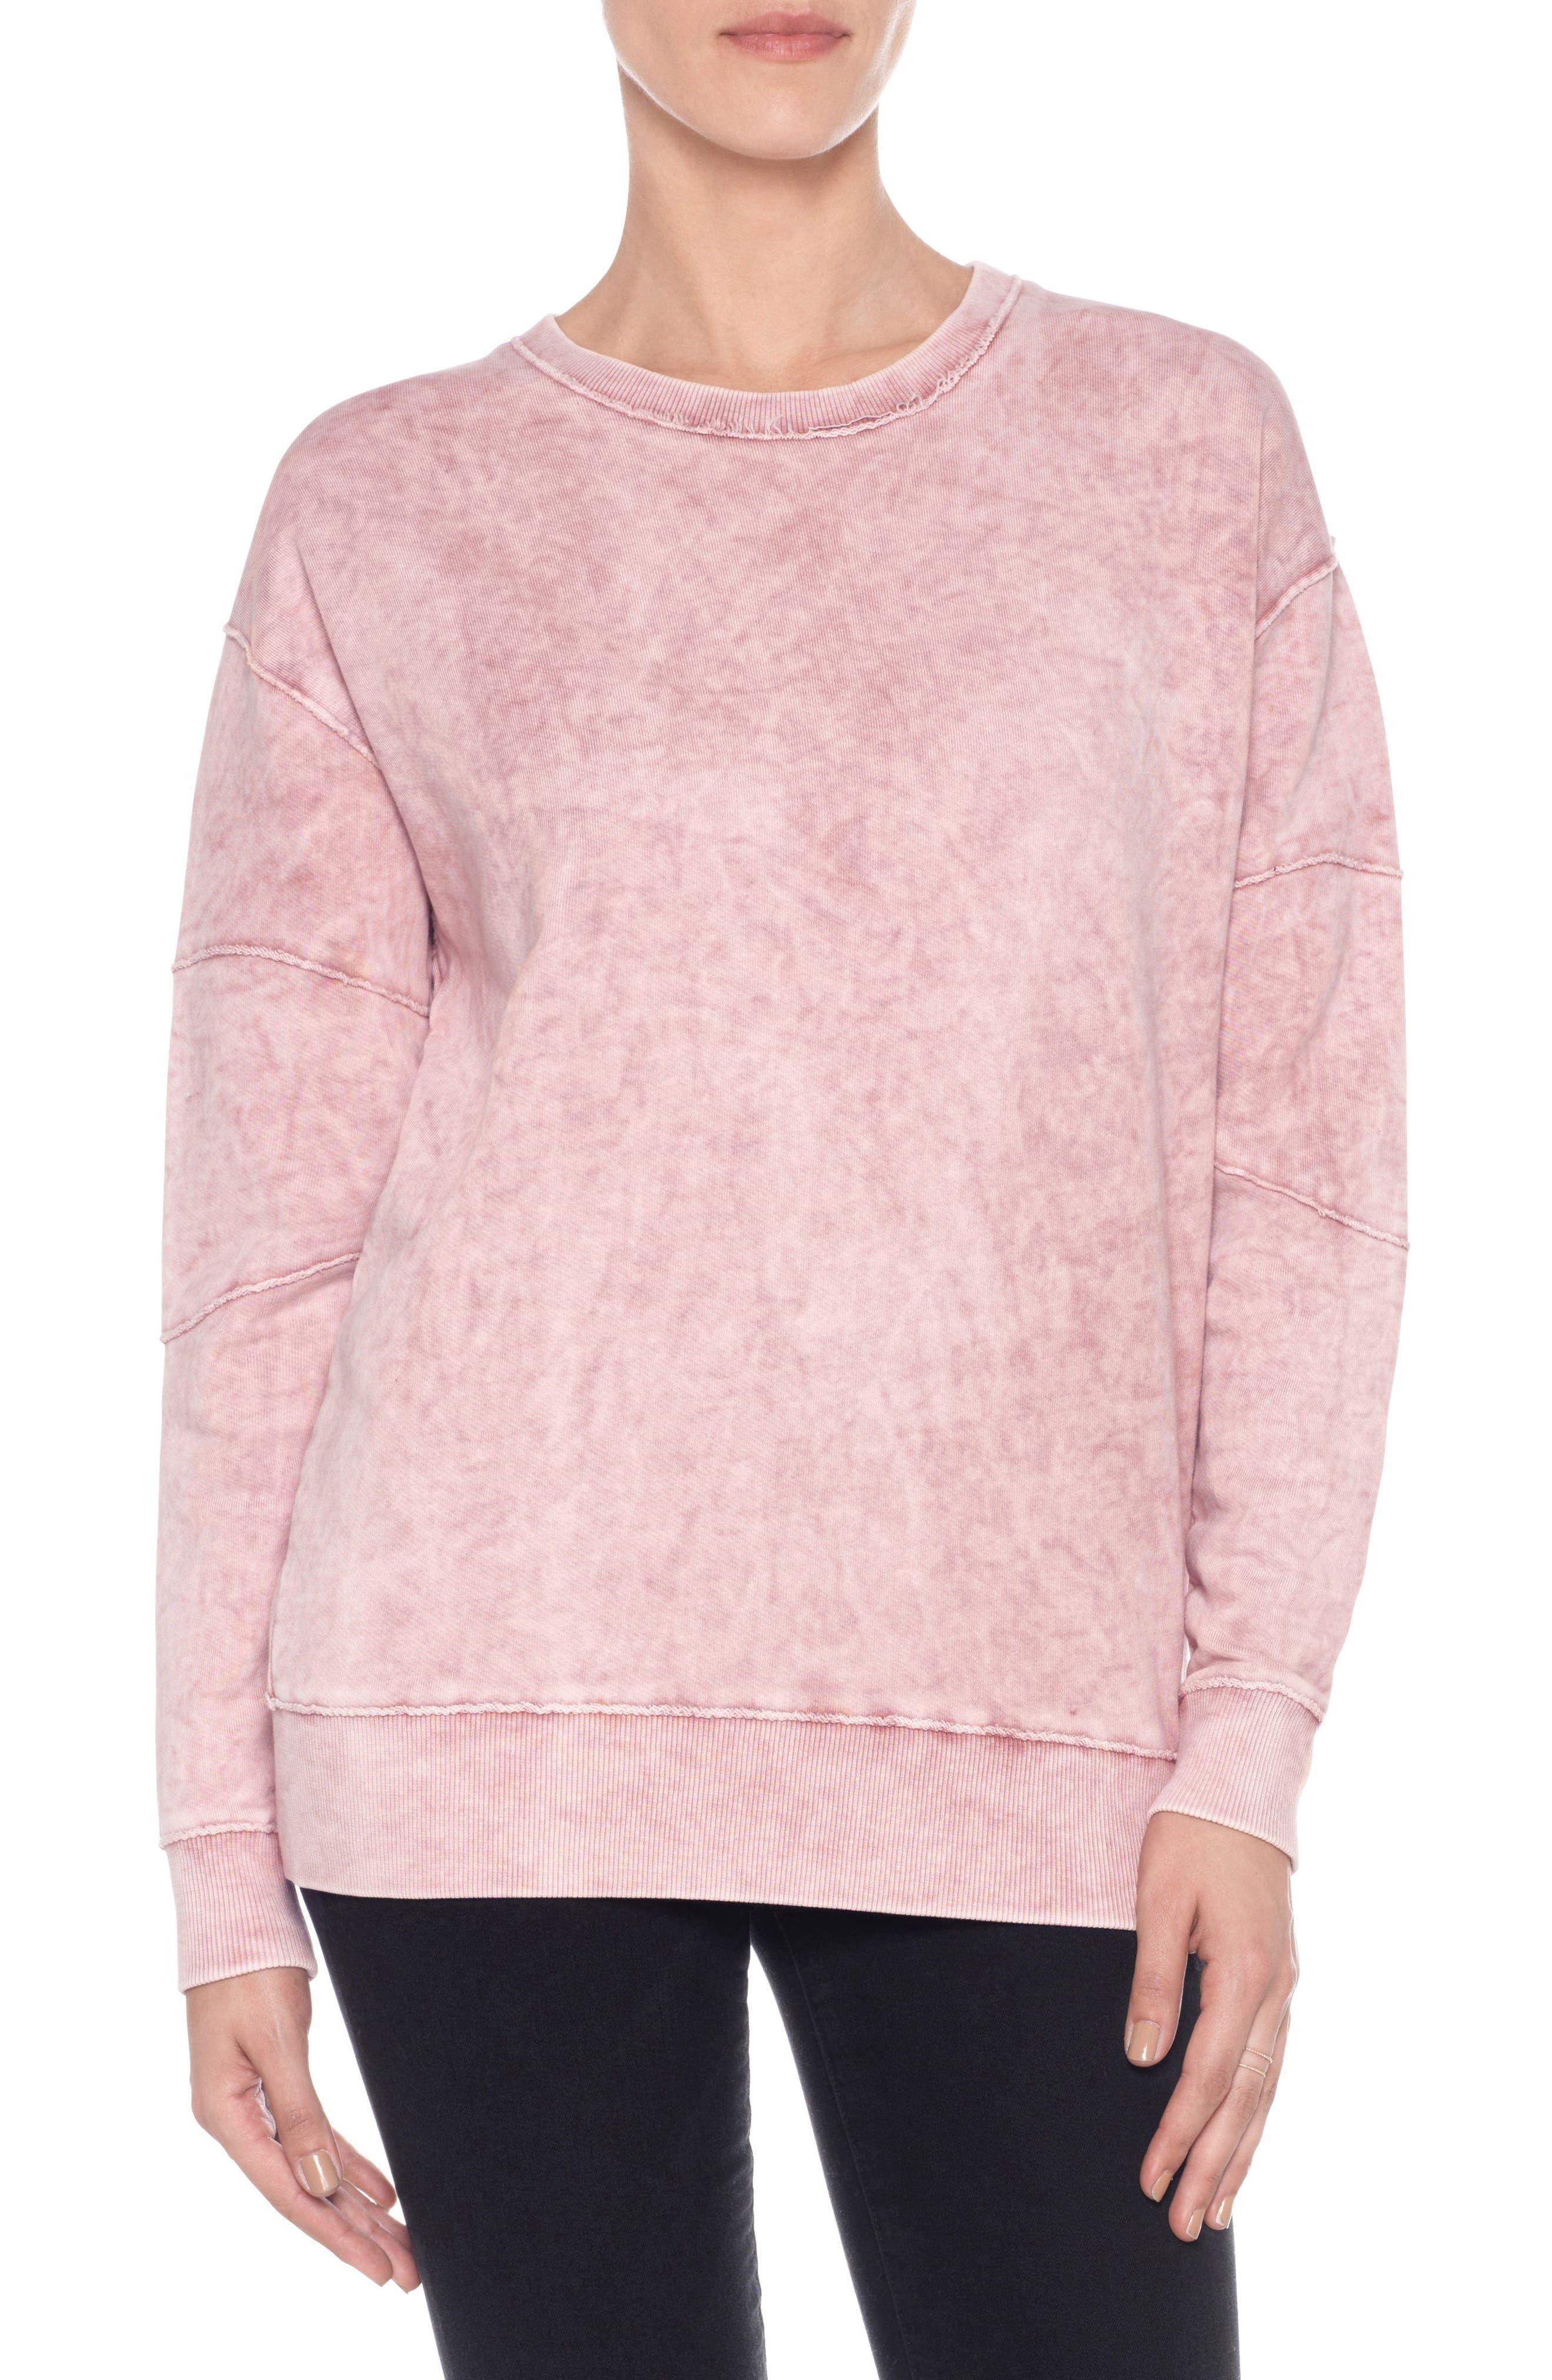 Kendall Sweatshirt,                         Main,                         color, 065